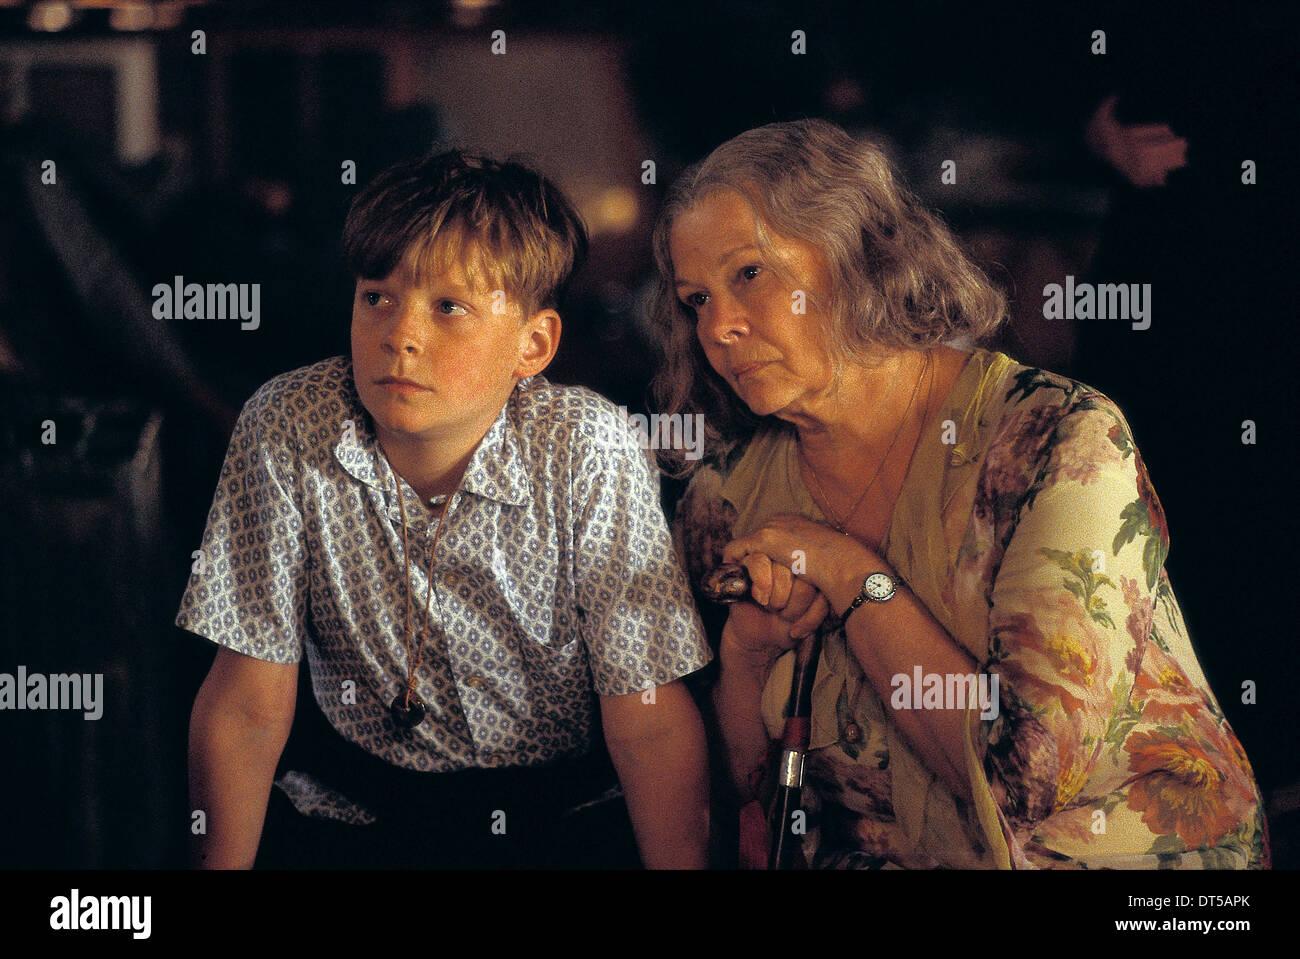 AURELIEN PARENT KOENIG & JUDI DENCH CHOCOLAT (2000) - Stock Image